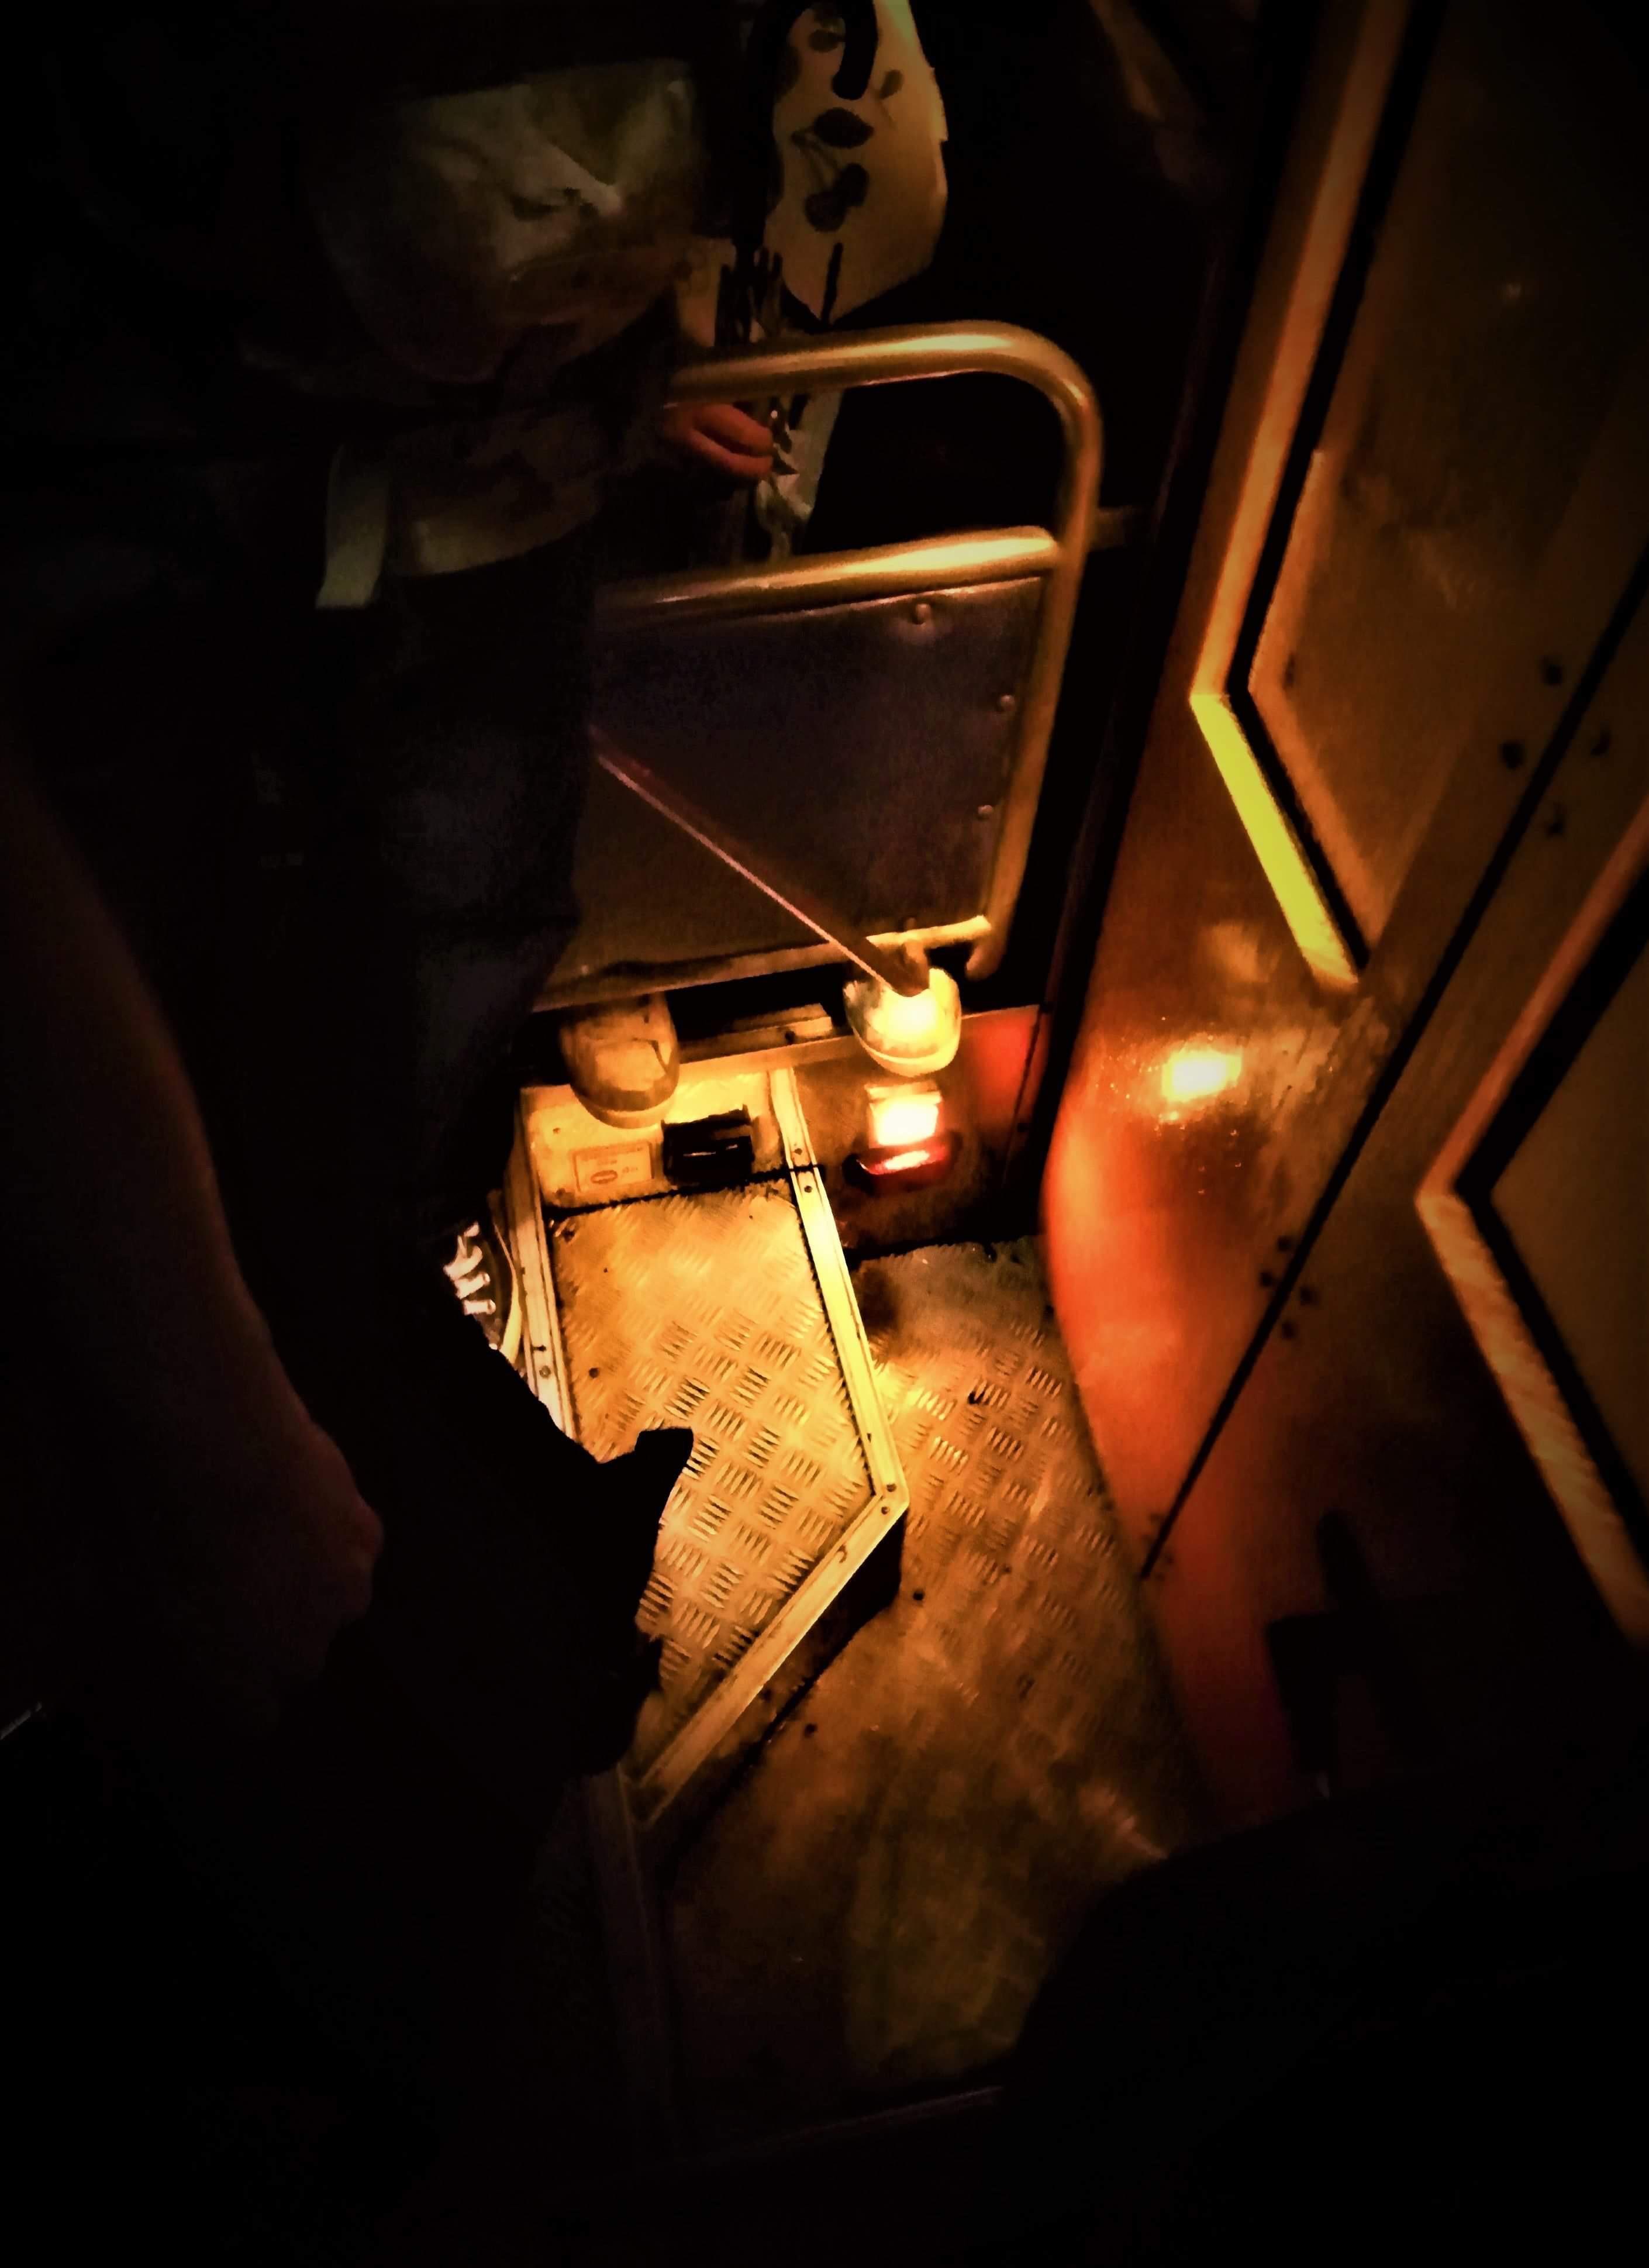 LIGHT IN THE DARK FROM BUS'S DOORSTEP 🚌🚎🚍💡( แสงในความมืดจากธรณีประตูรถเมล์ 🚌🚎🚍💡)